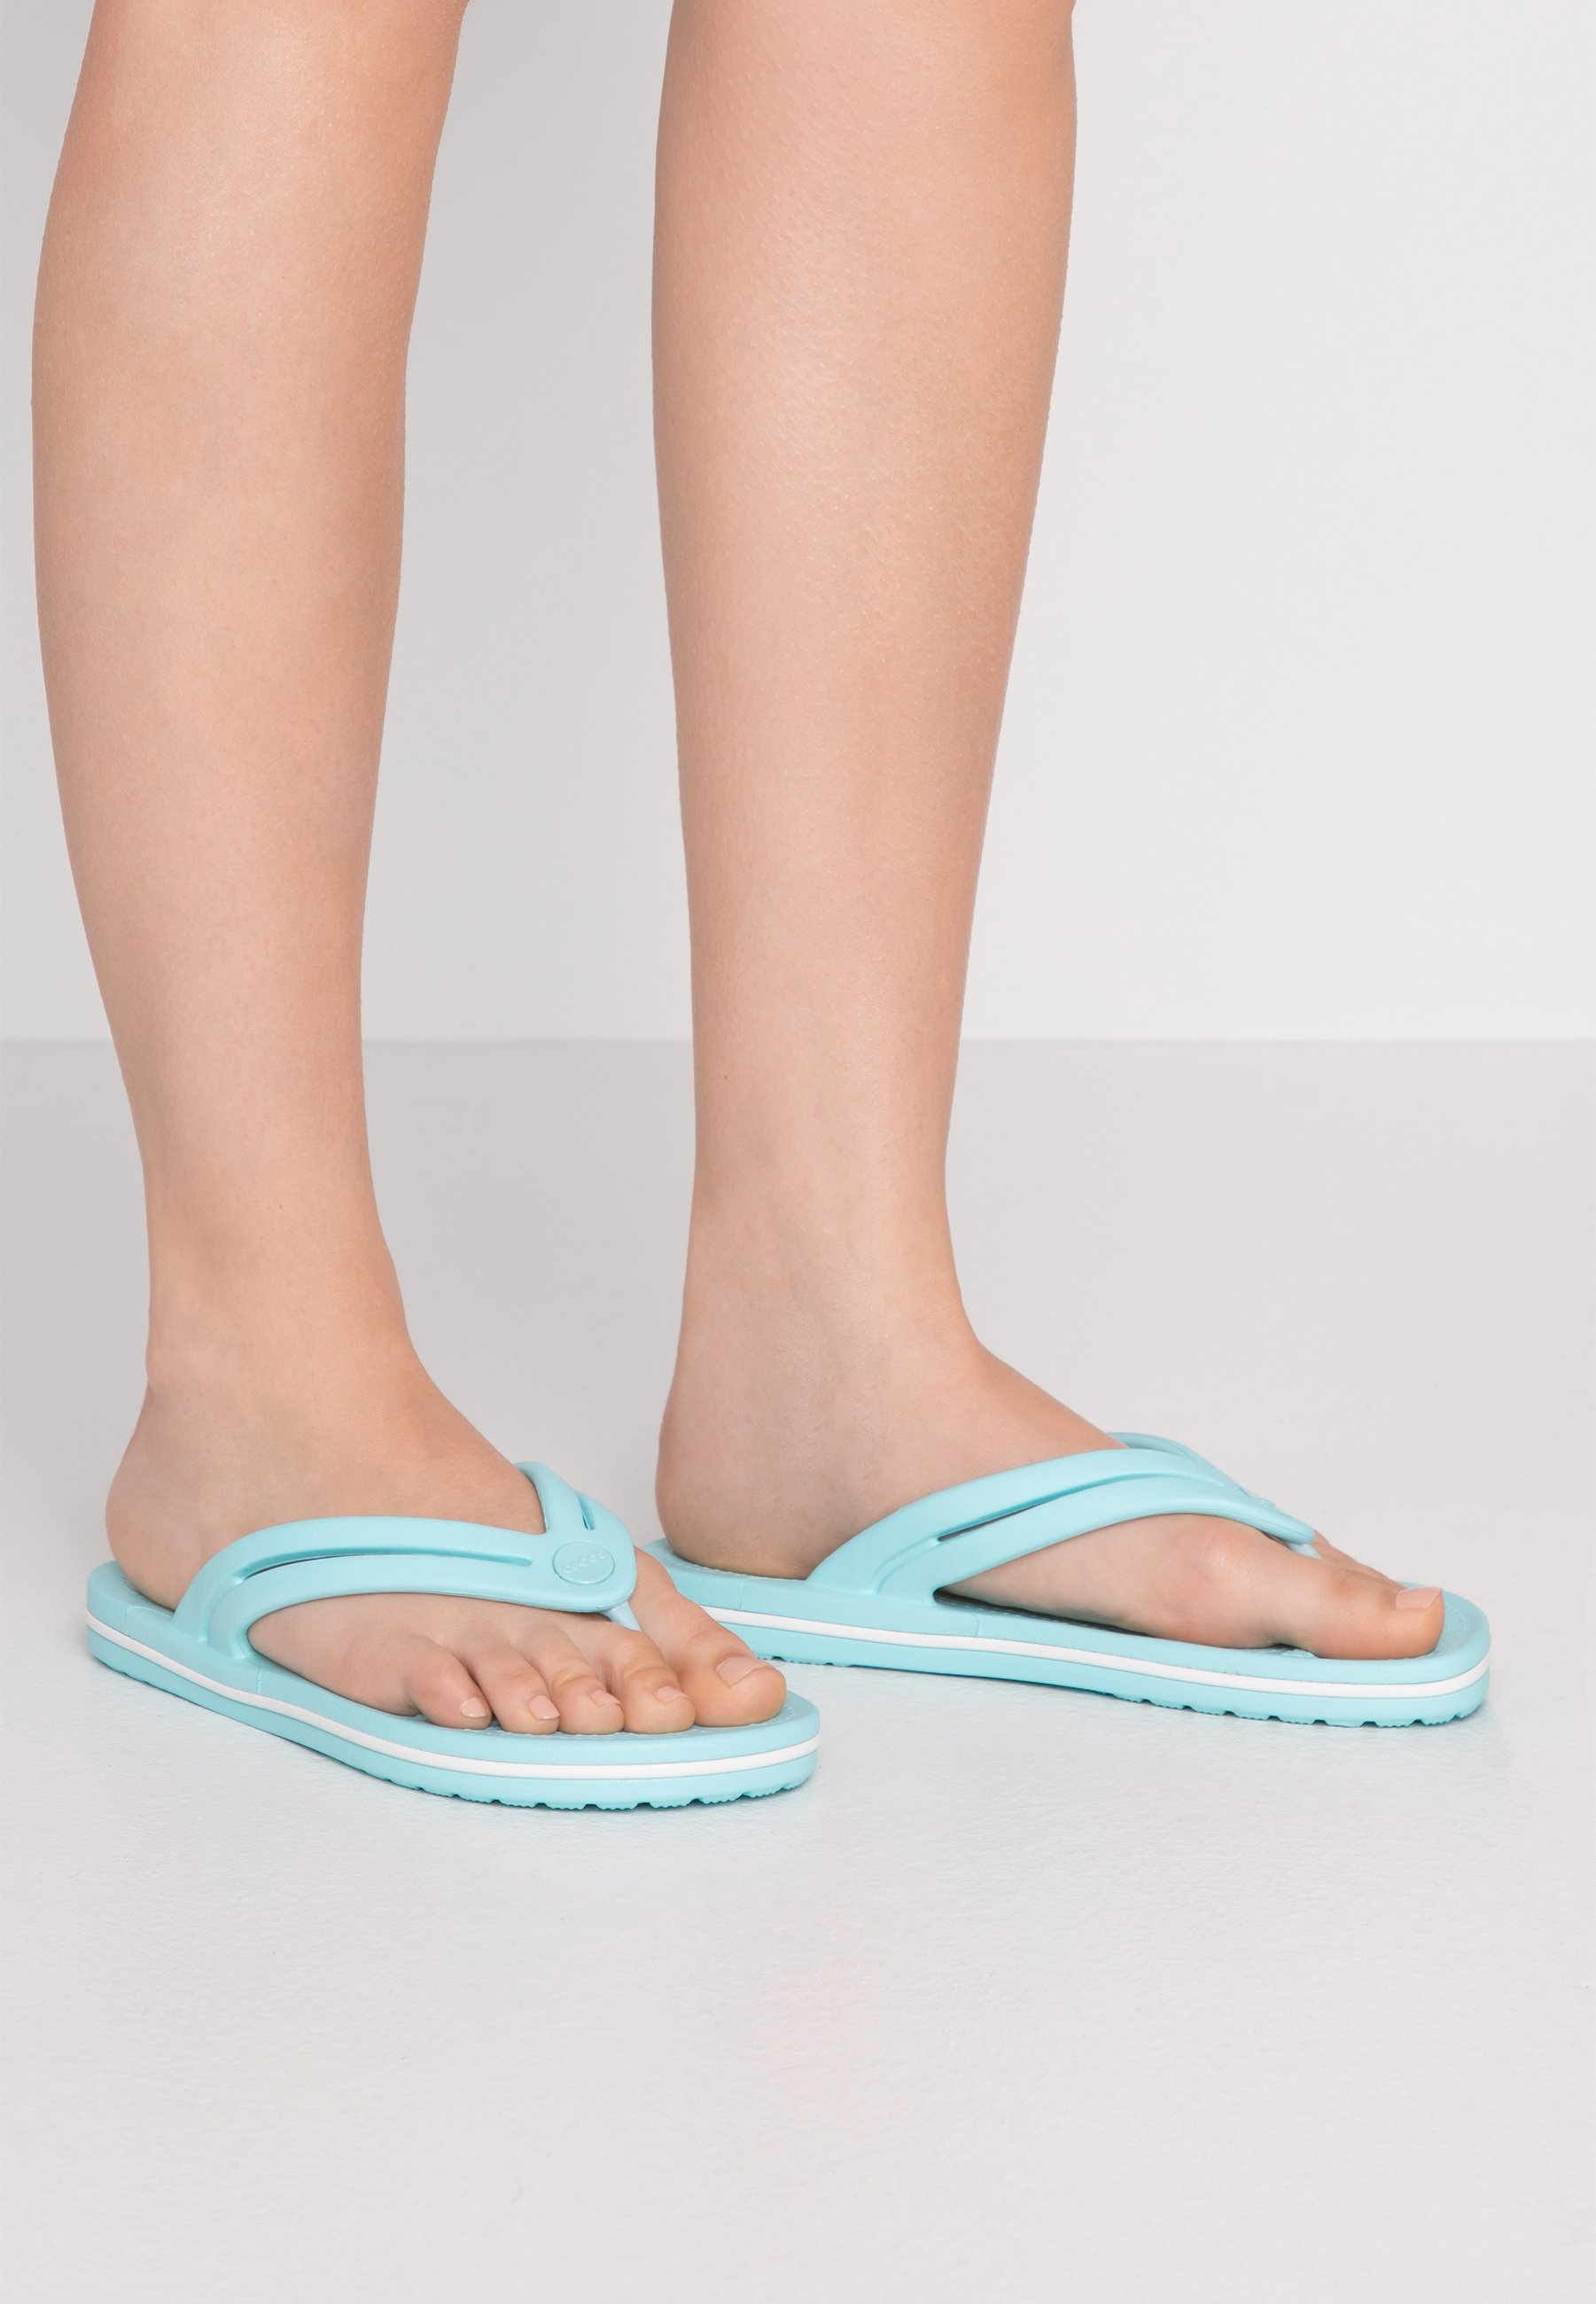 Scarpe da donna Crocs CROCBAND Infradito da bagno ice blue